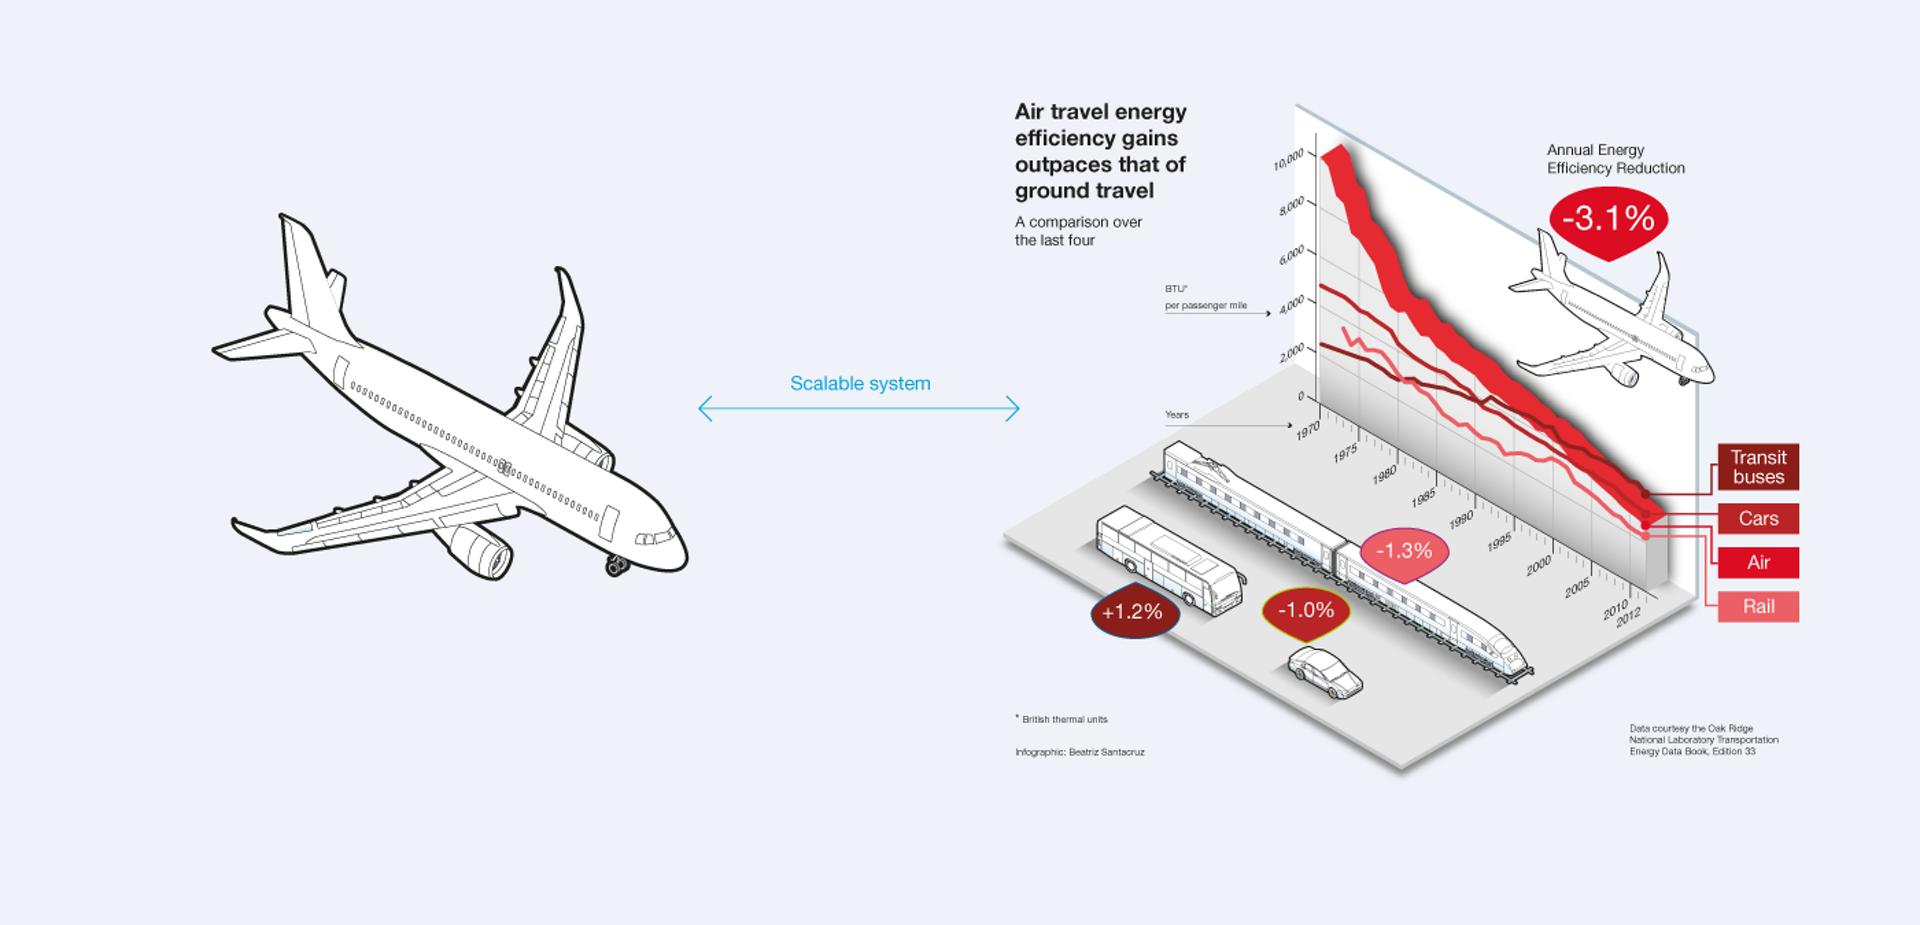 Illustration Overview